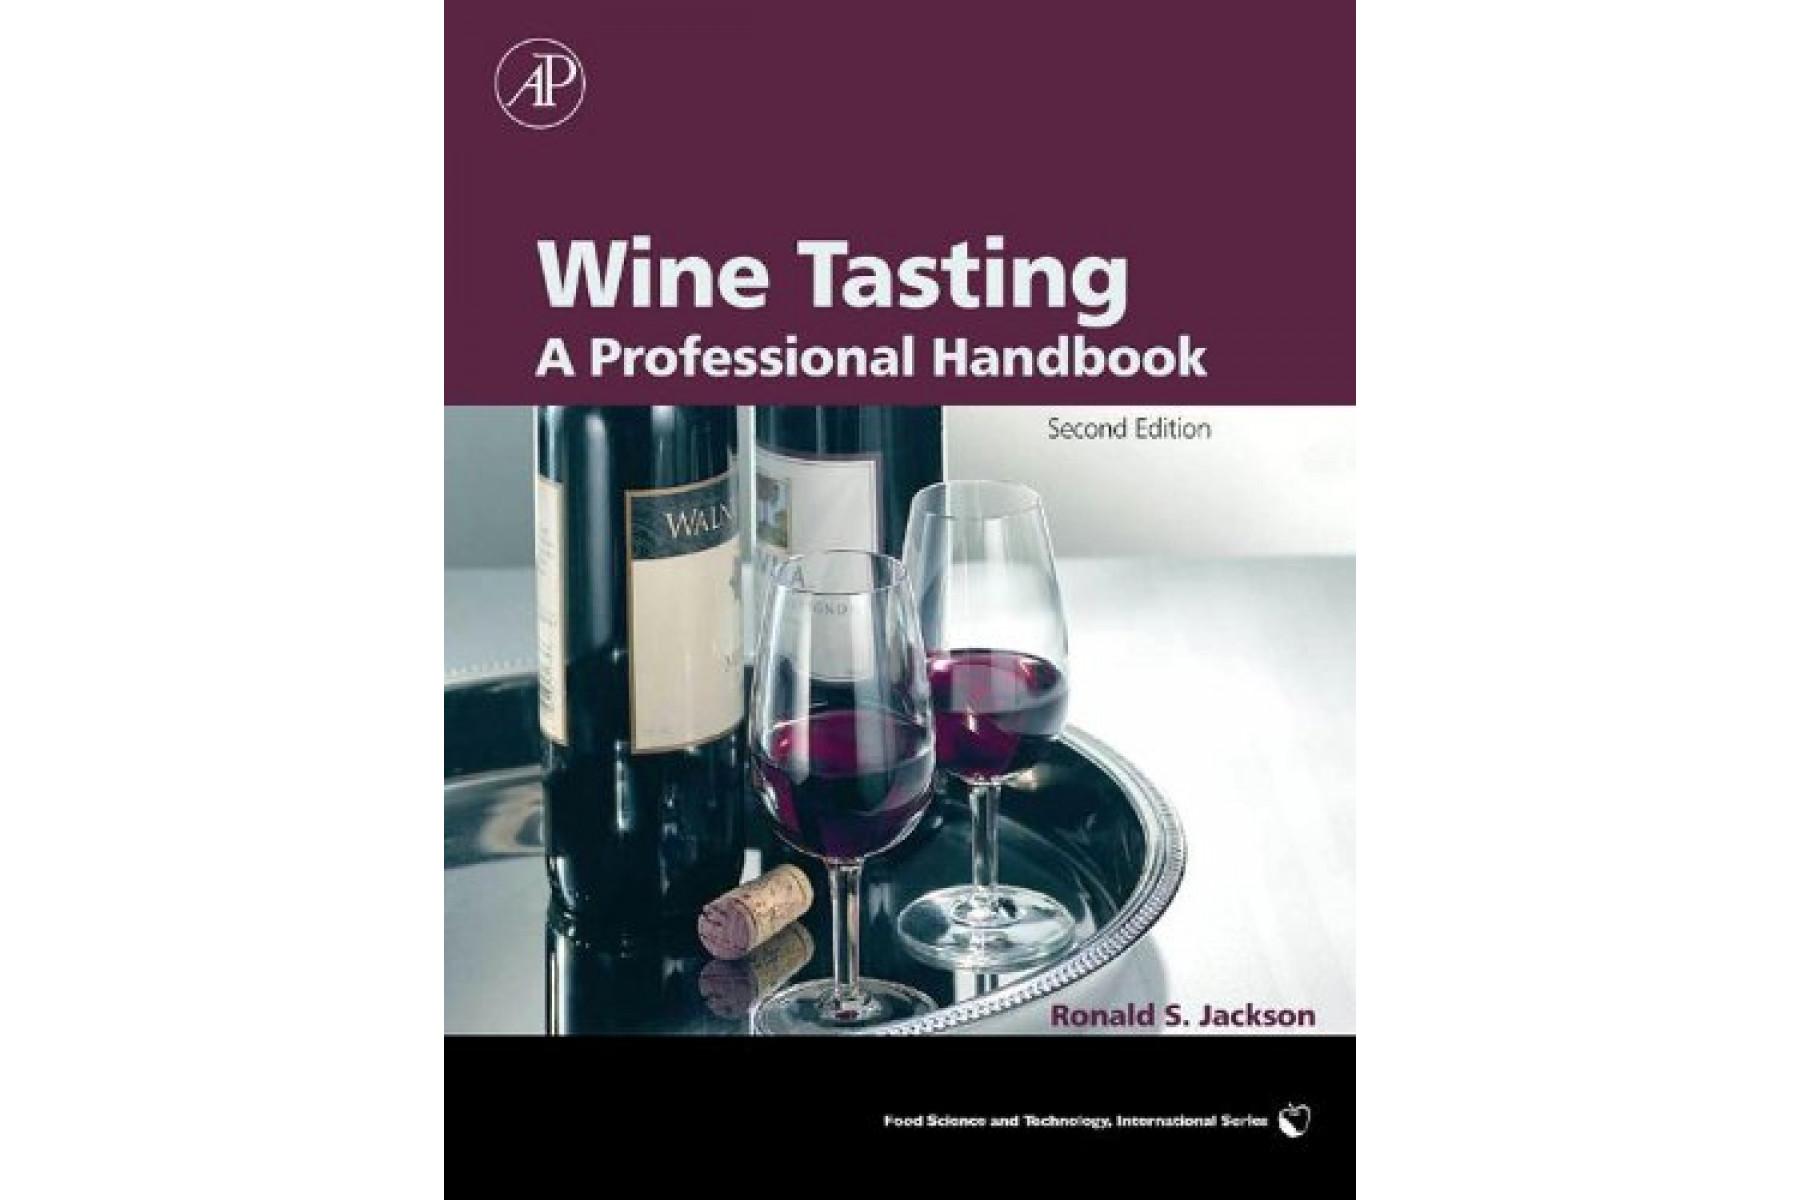 Wine Tasting: A Professional Handbook